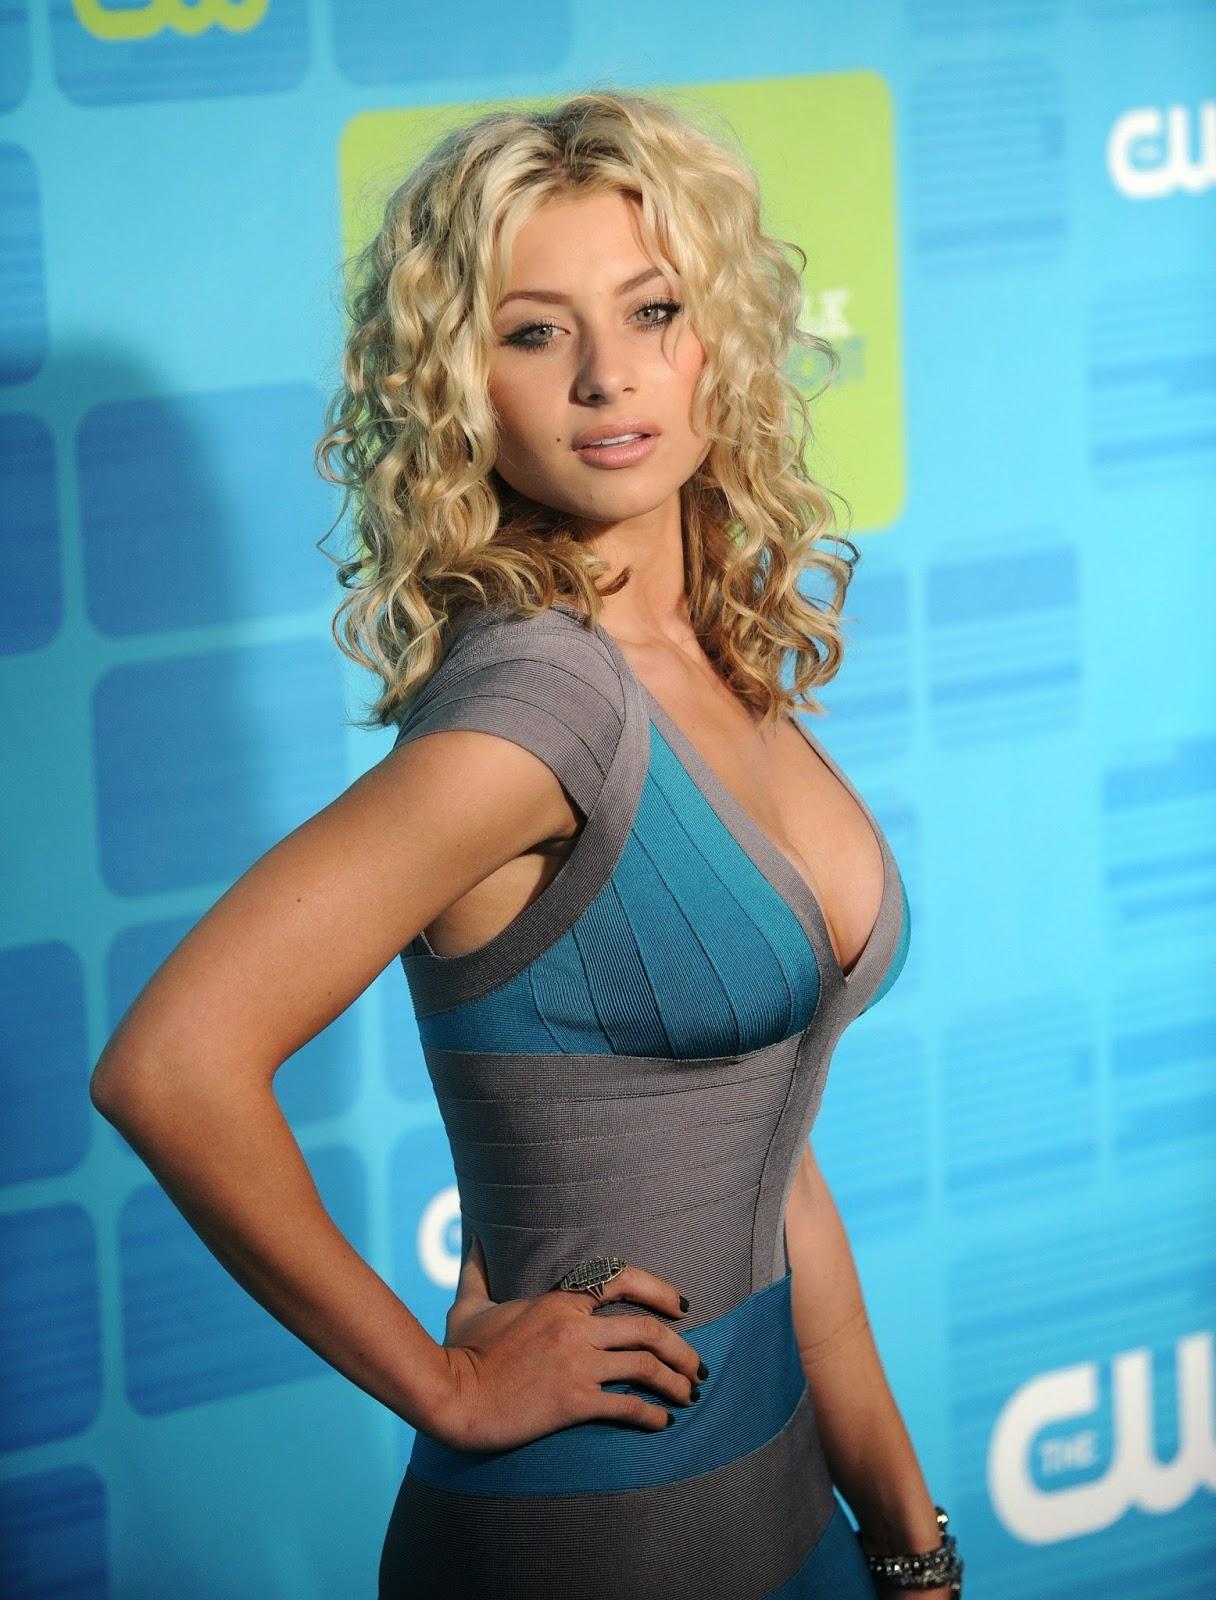 Latest Celebrity Photos: Aly Michalka Latest Sexy Hot